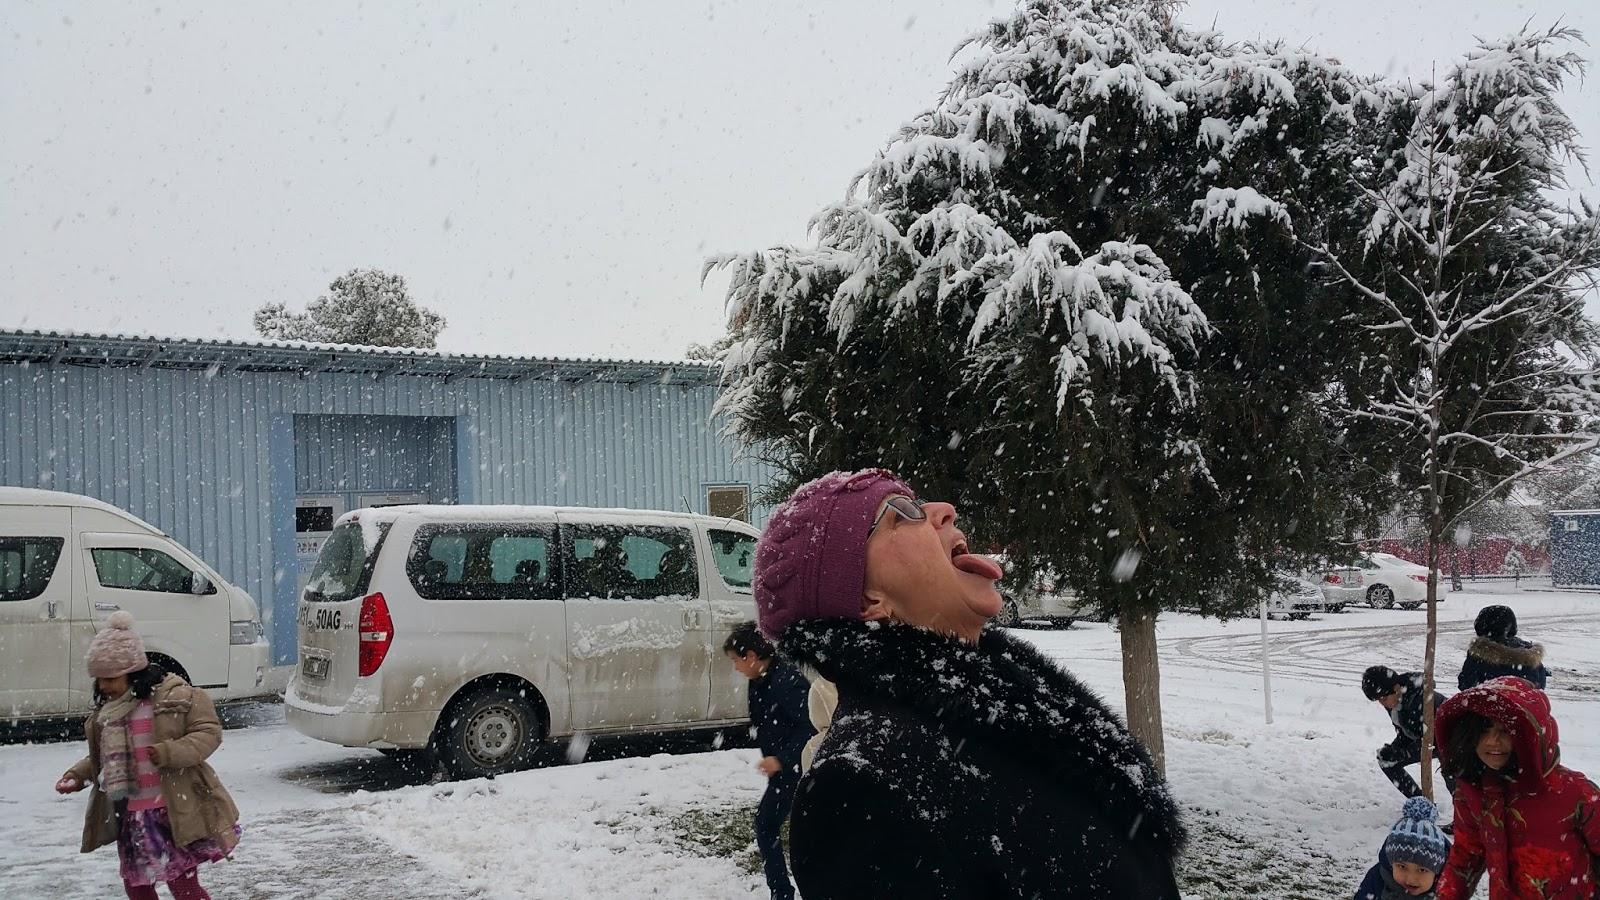 Turkmenistan 2017: 170304 Winter in Ashgabat